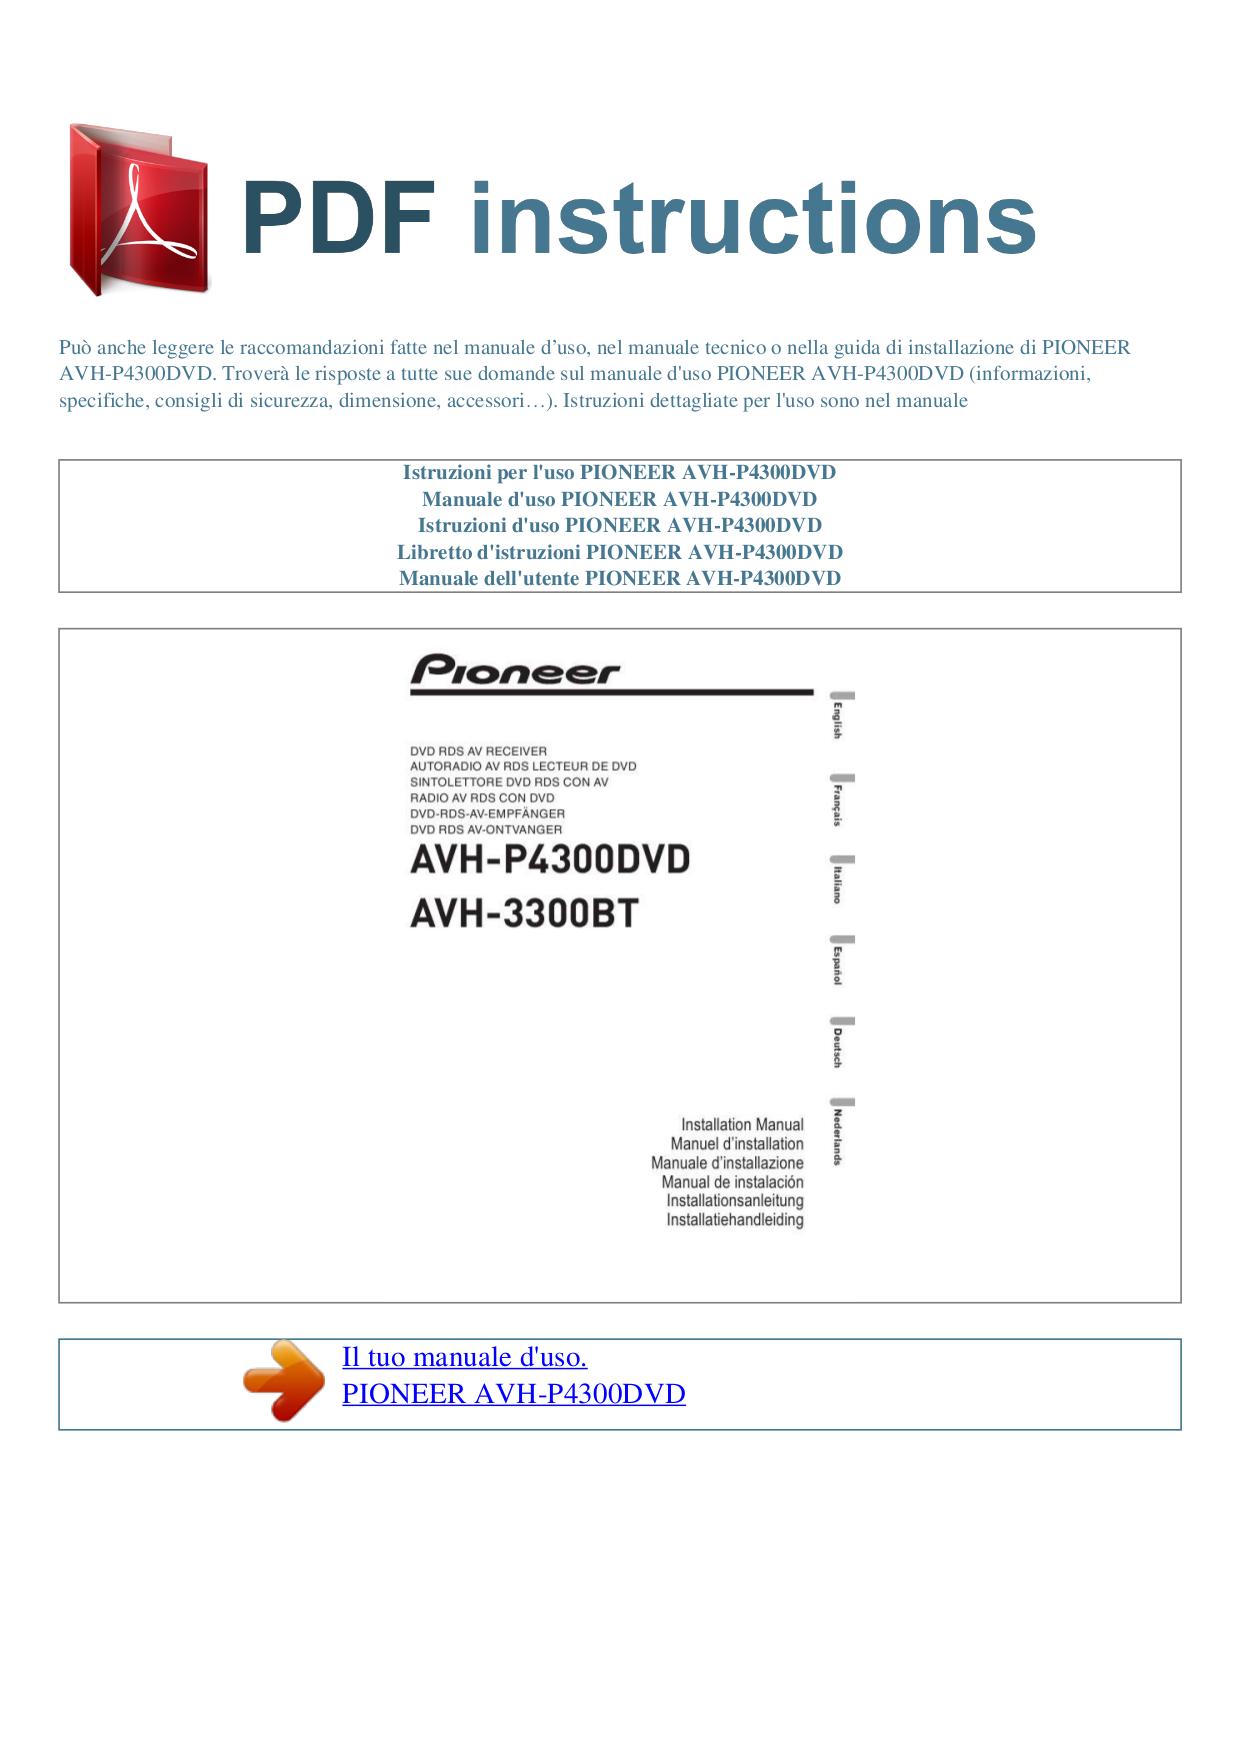 Download Free Pdf For Pioneer Avhp4300dvd Car Video Manual. Pdf For Pioneer Car Video Avhp4300dvd Manual. Wiring. Pioneer Avh P4300 Wiring Diagram At Scoala.co